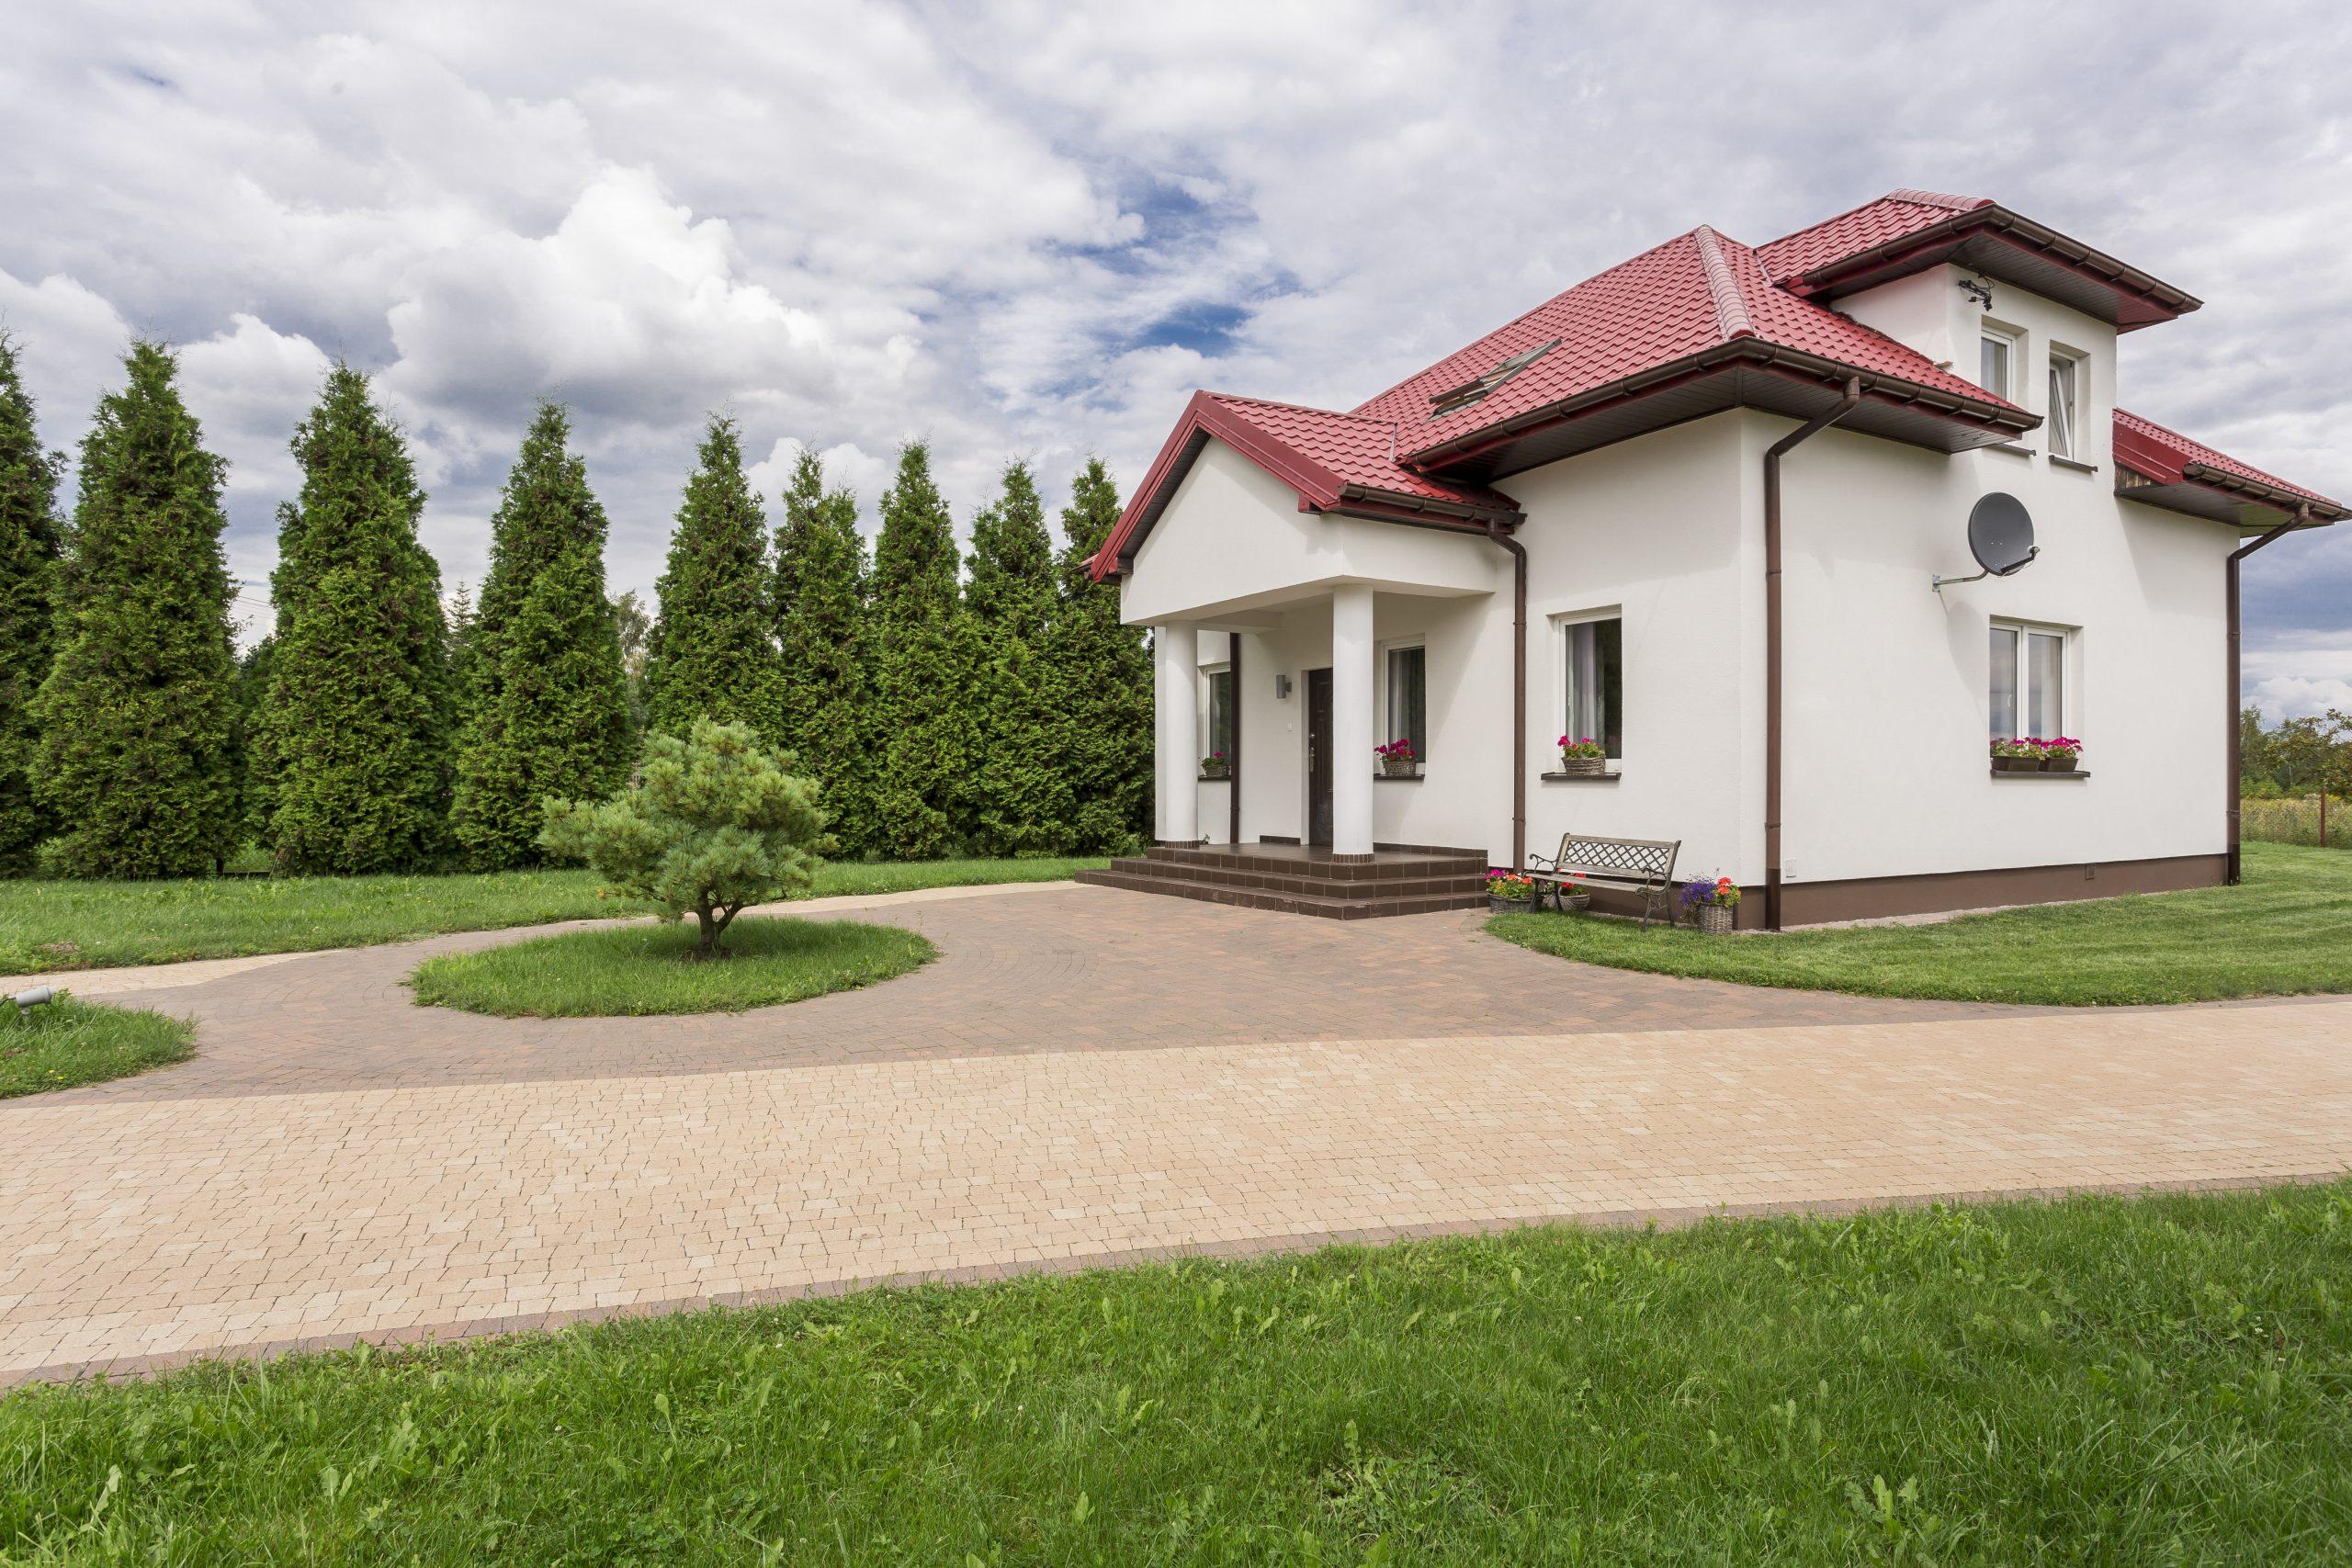 Casa de 150 M2 en 3.300 UF house in the suburbs PVYU5G3 scaled